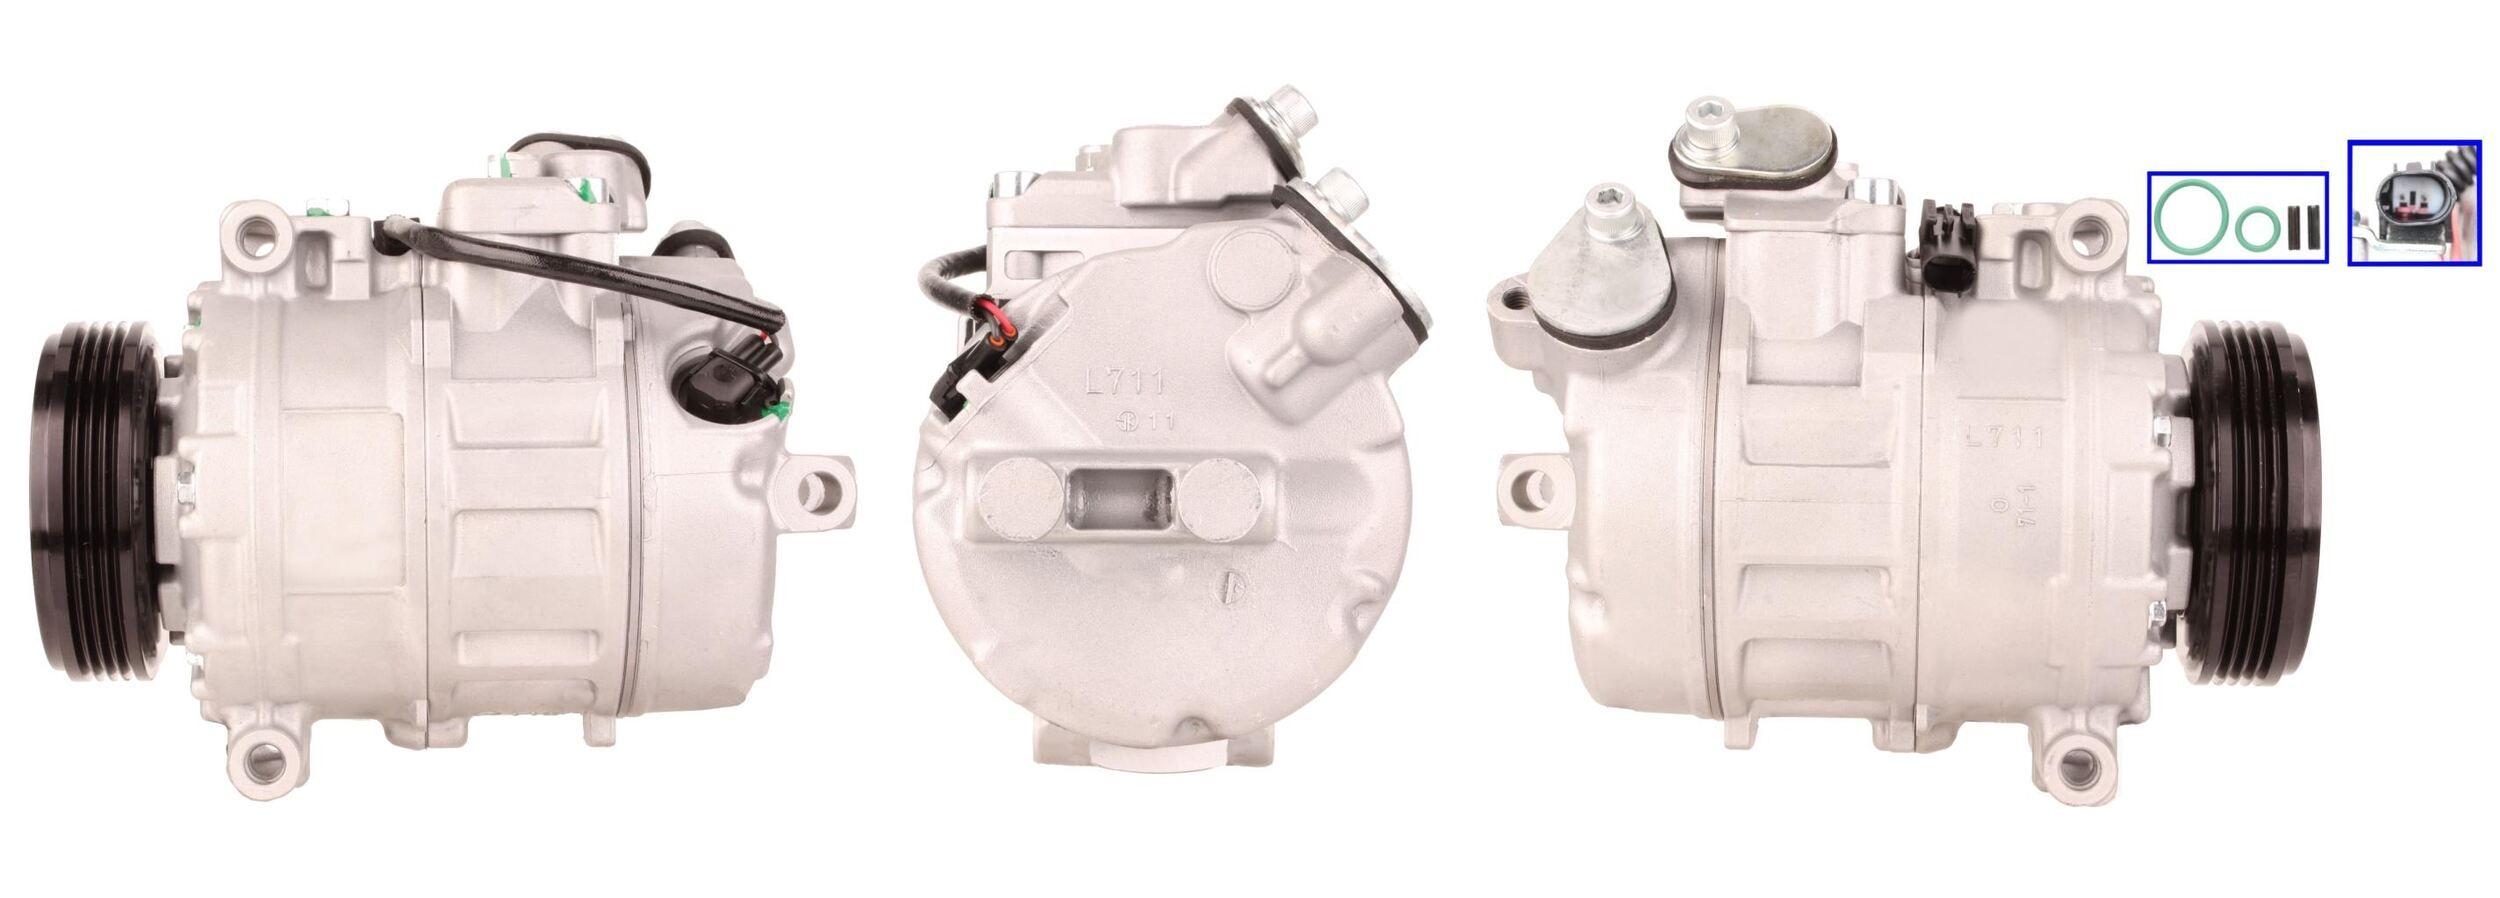 Klimakompressor ELSTOCK 51-0244